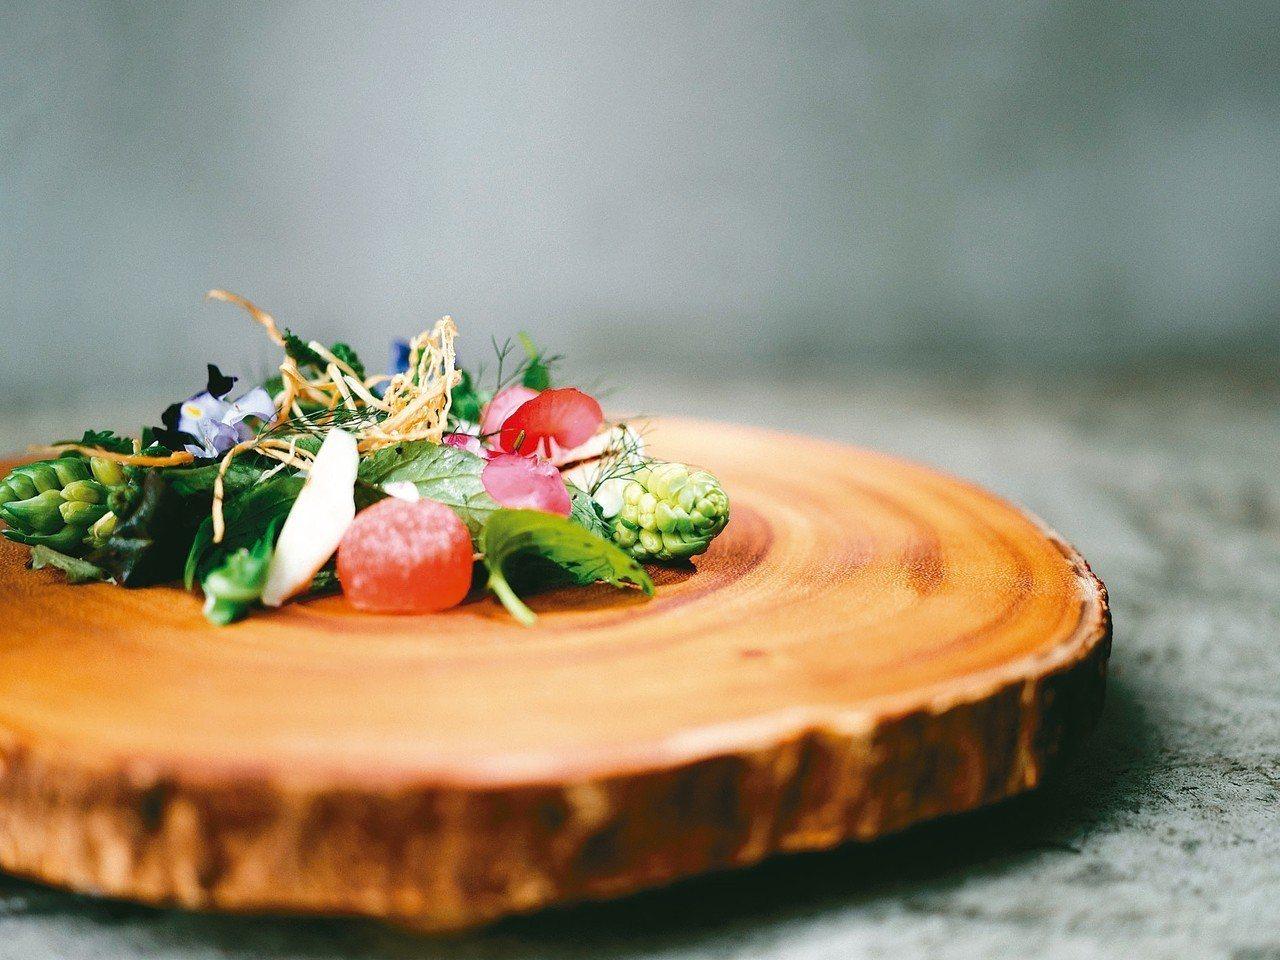 MUME團隊著重使用在地食材,菜色清秀有創意。 圖/MUME提供